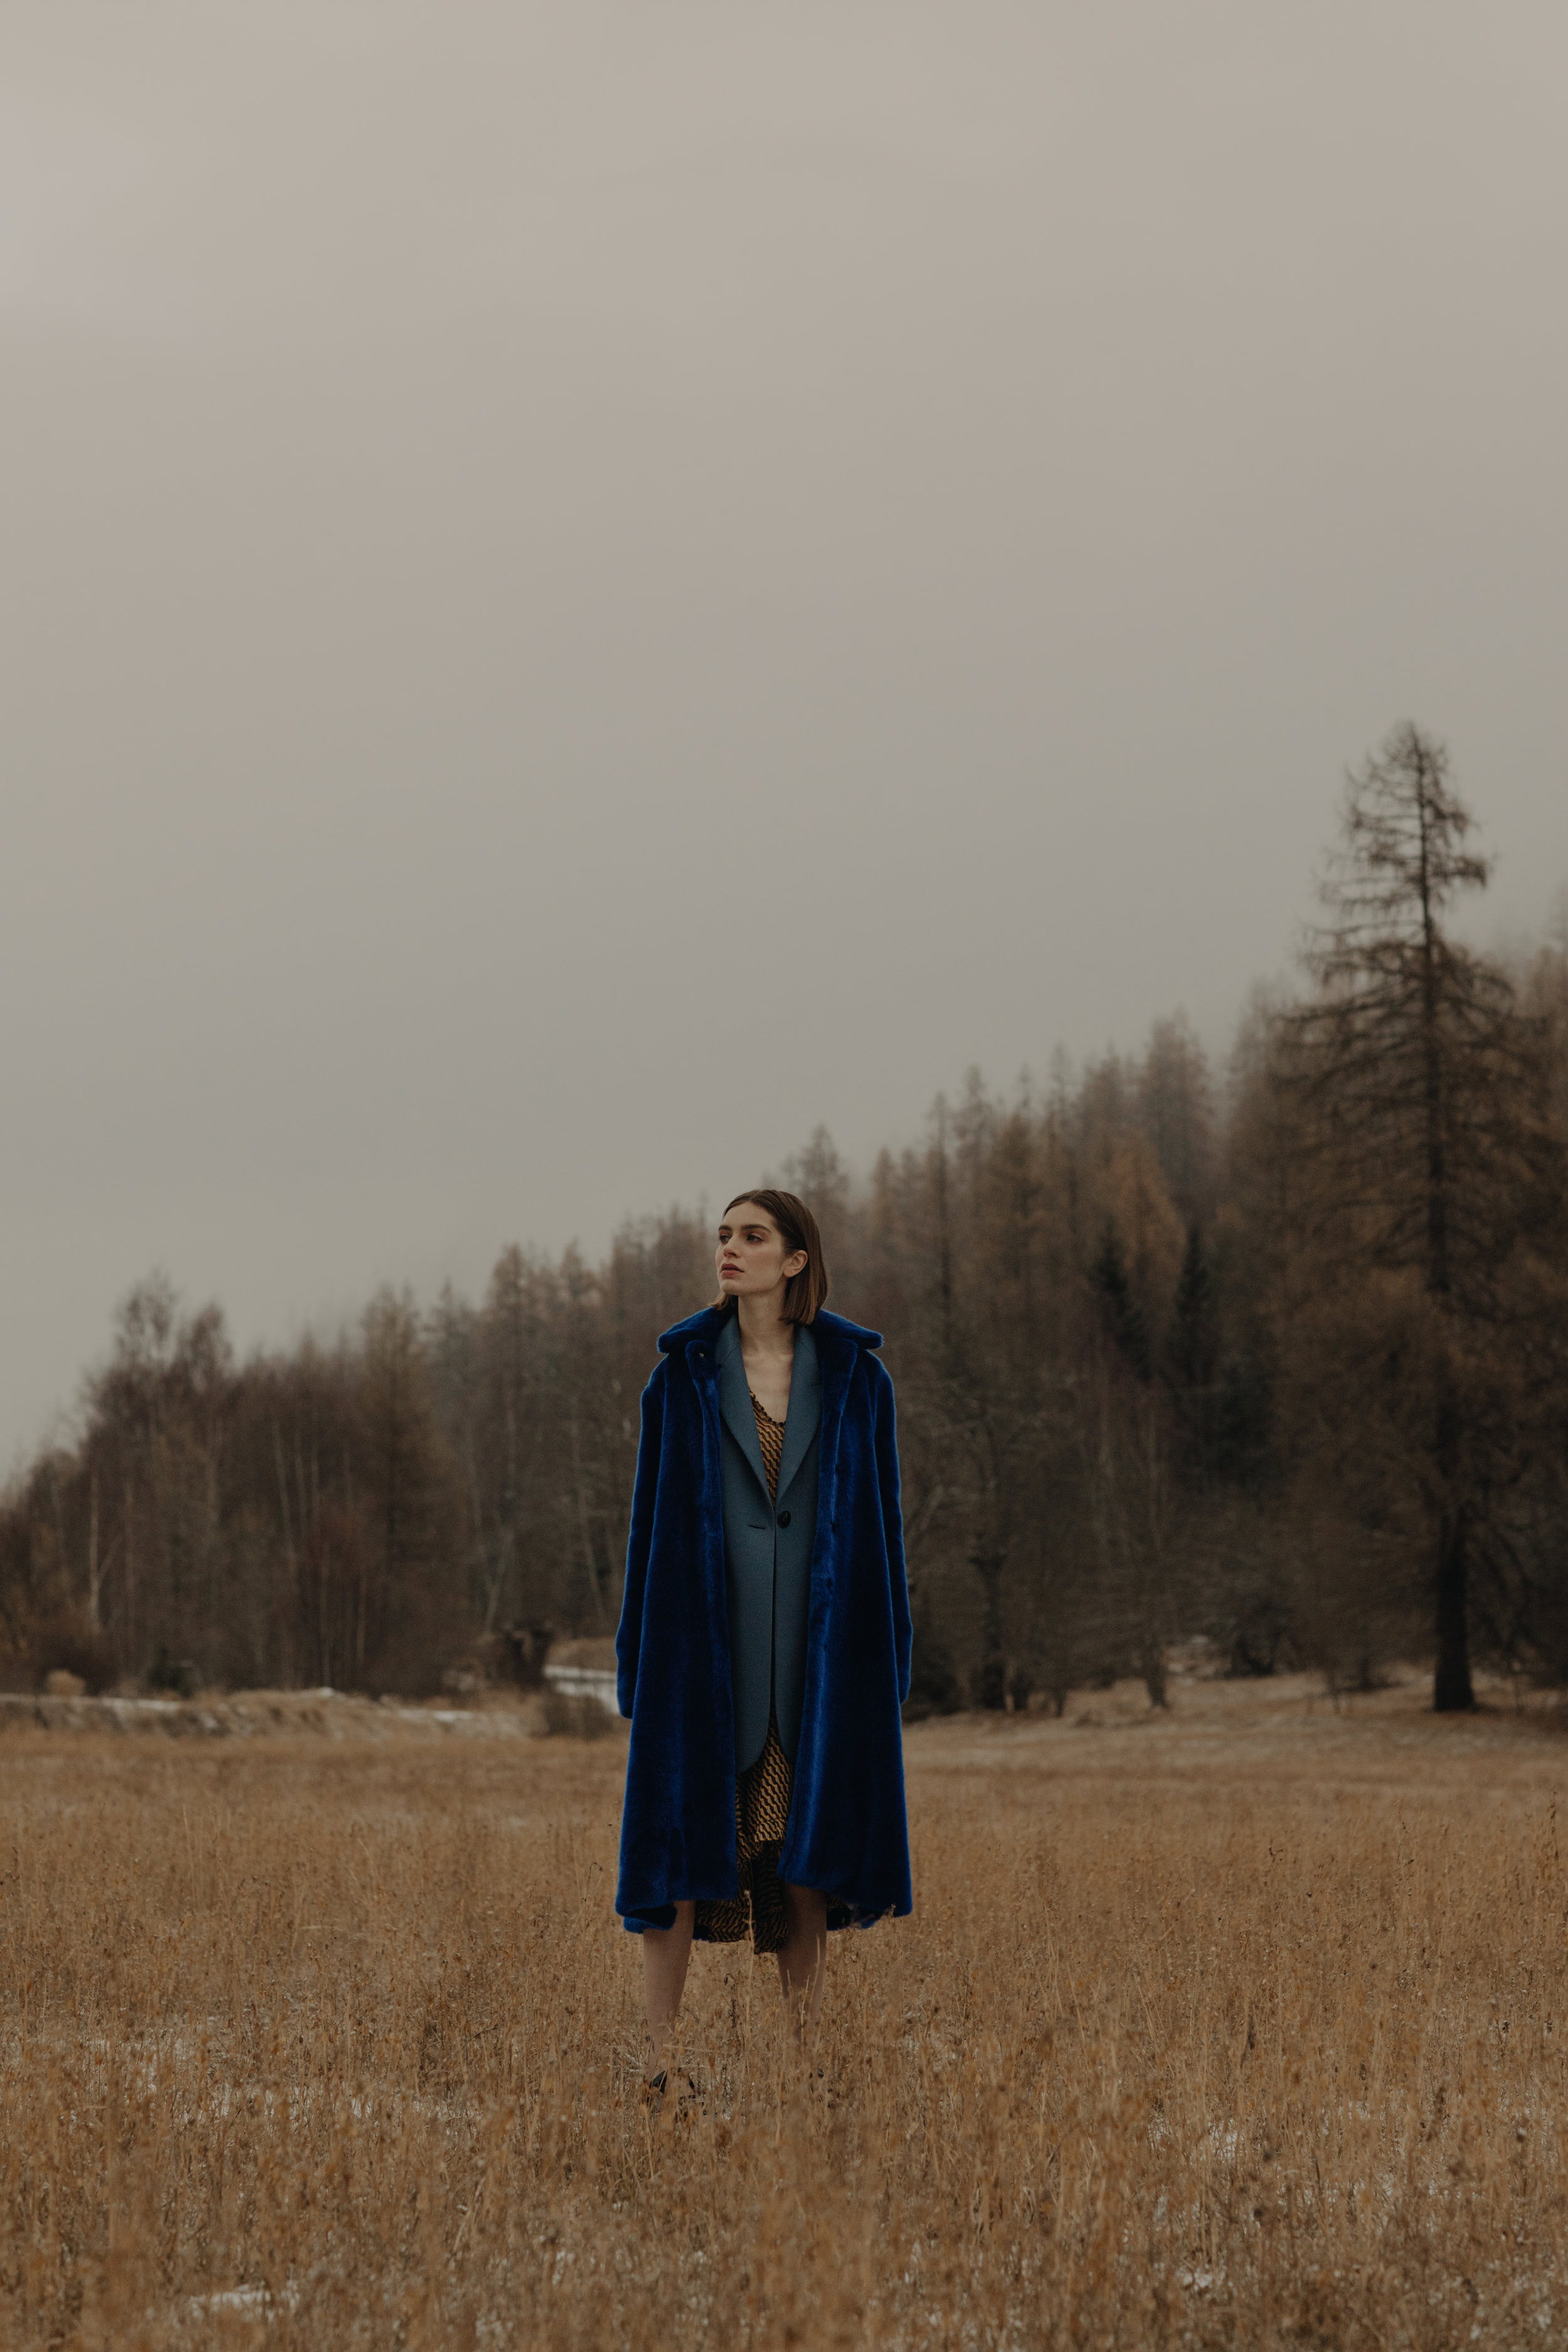 Coat  PHILIPPE PERISSE  Jacket  ACNE STUDIOS   Dress  MERCI   Shoes  ADIEU